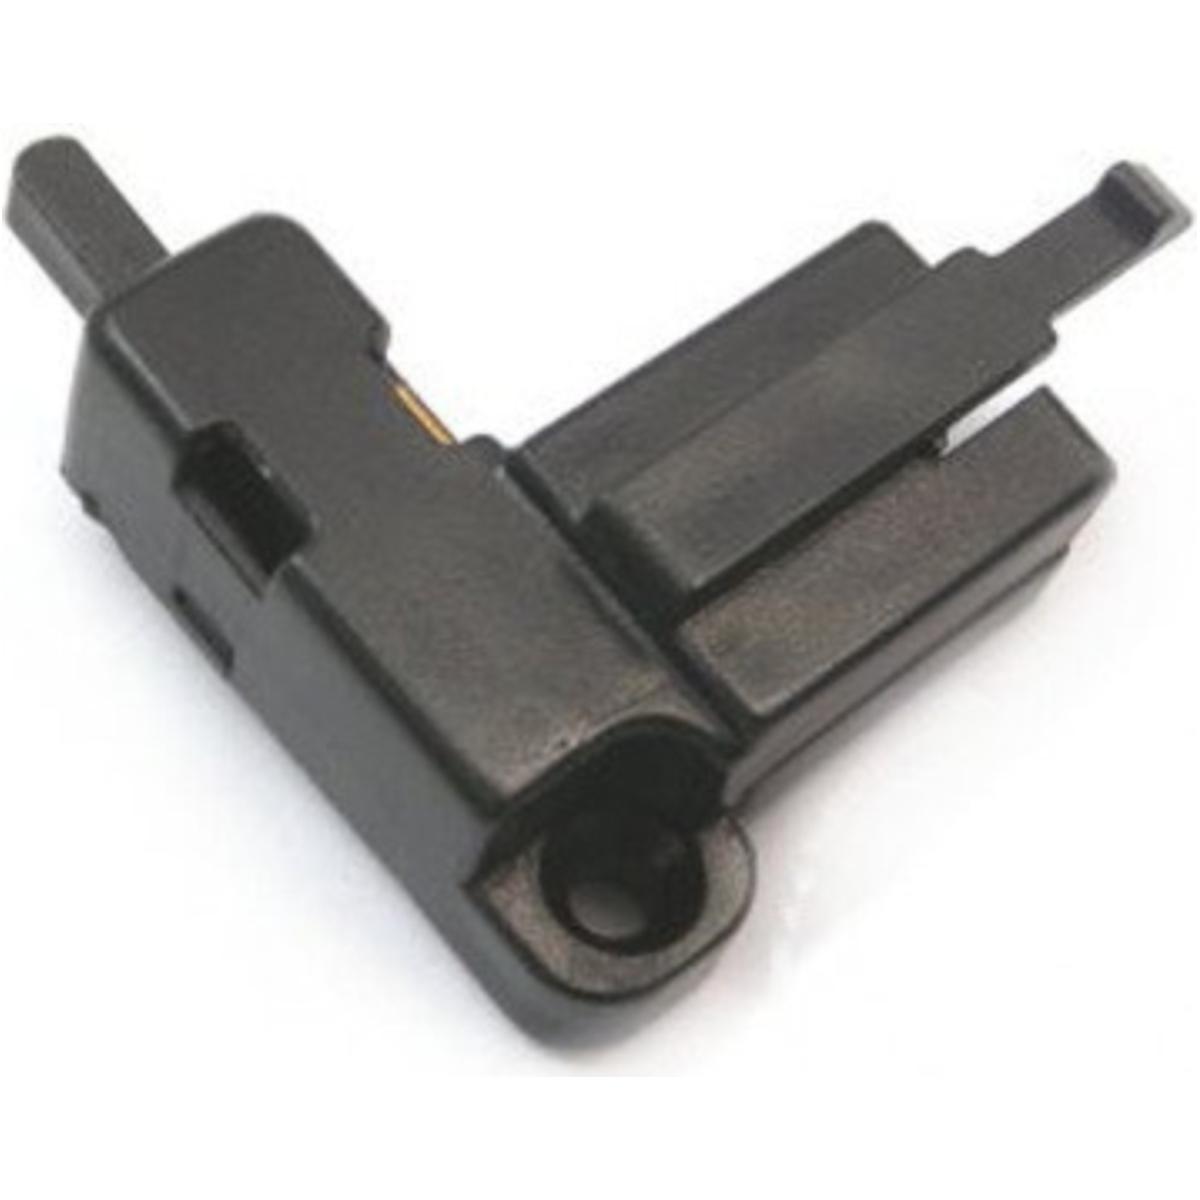 Clutch cut out switch jmp BD220132 Yamaha FZR Genesis 21139